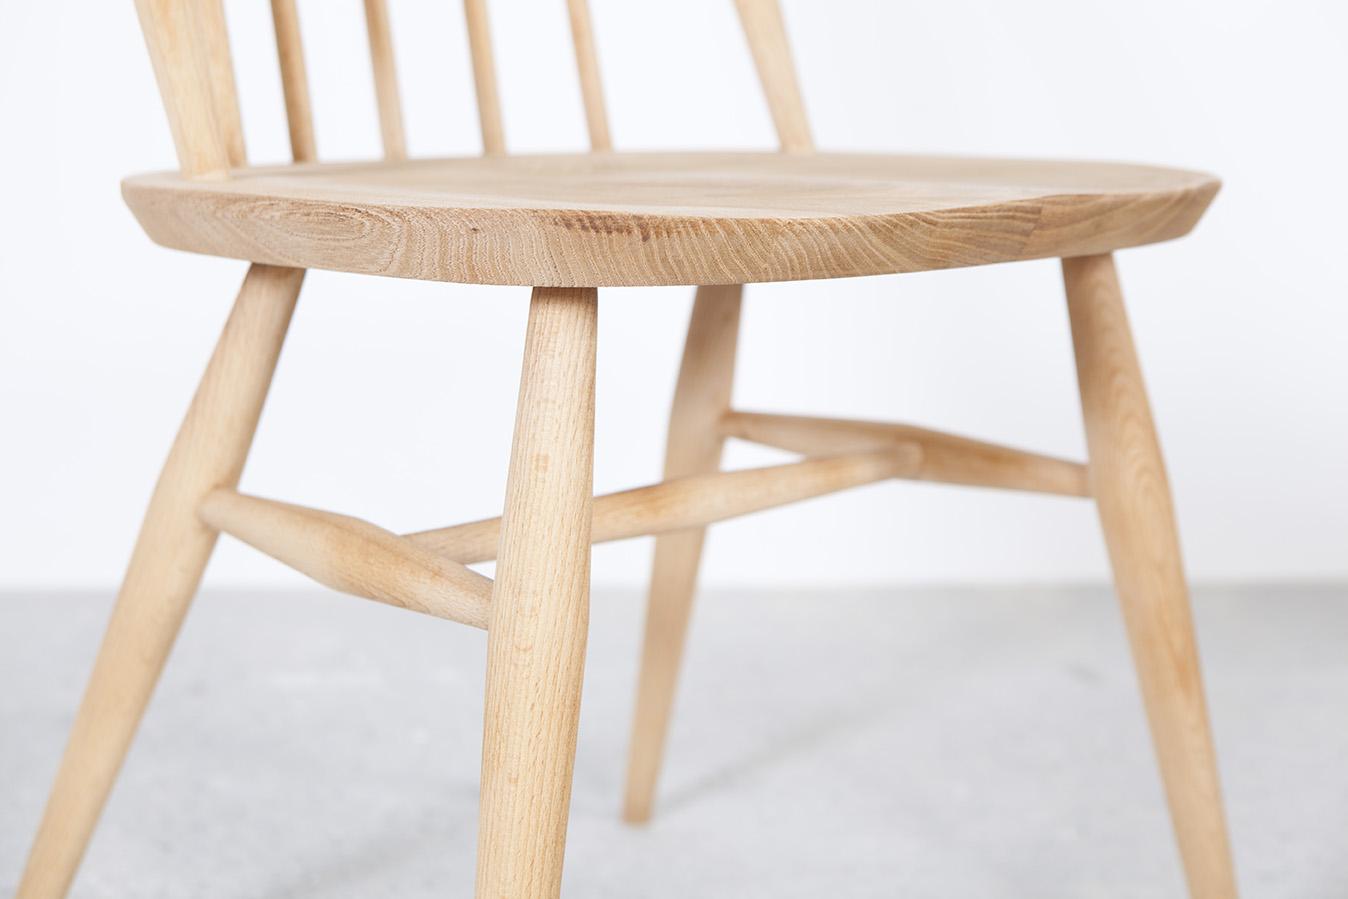 silla de madera original vintage ercol ercolani ligera elegante de comedor